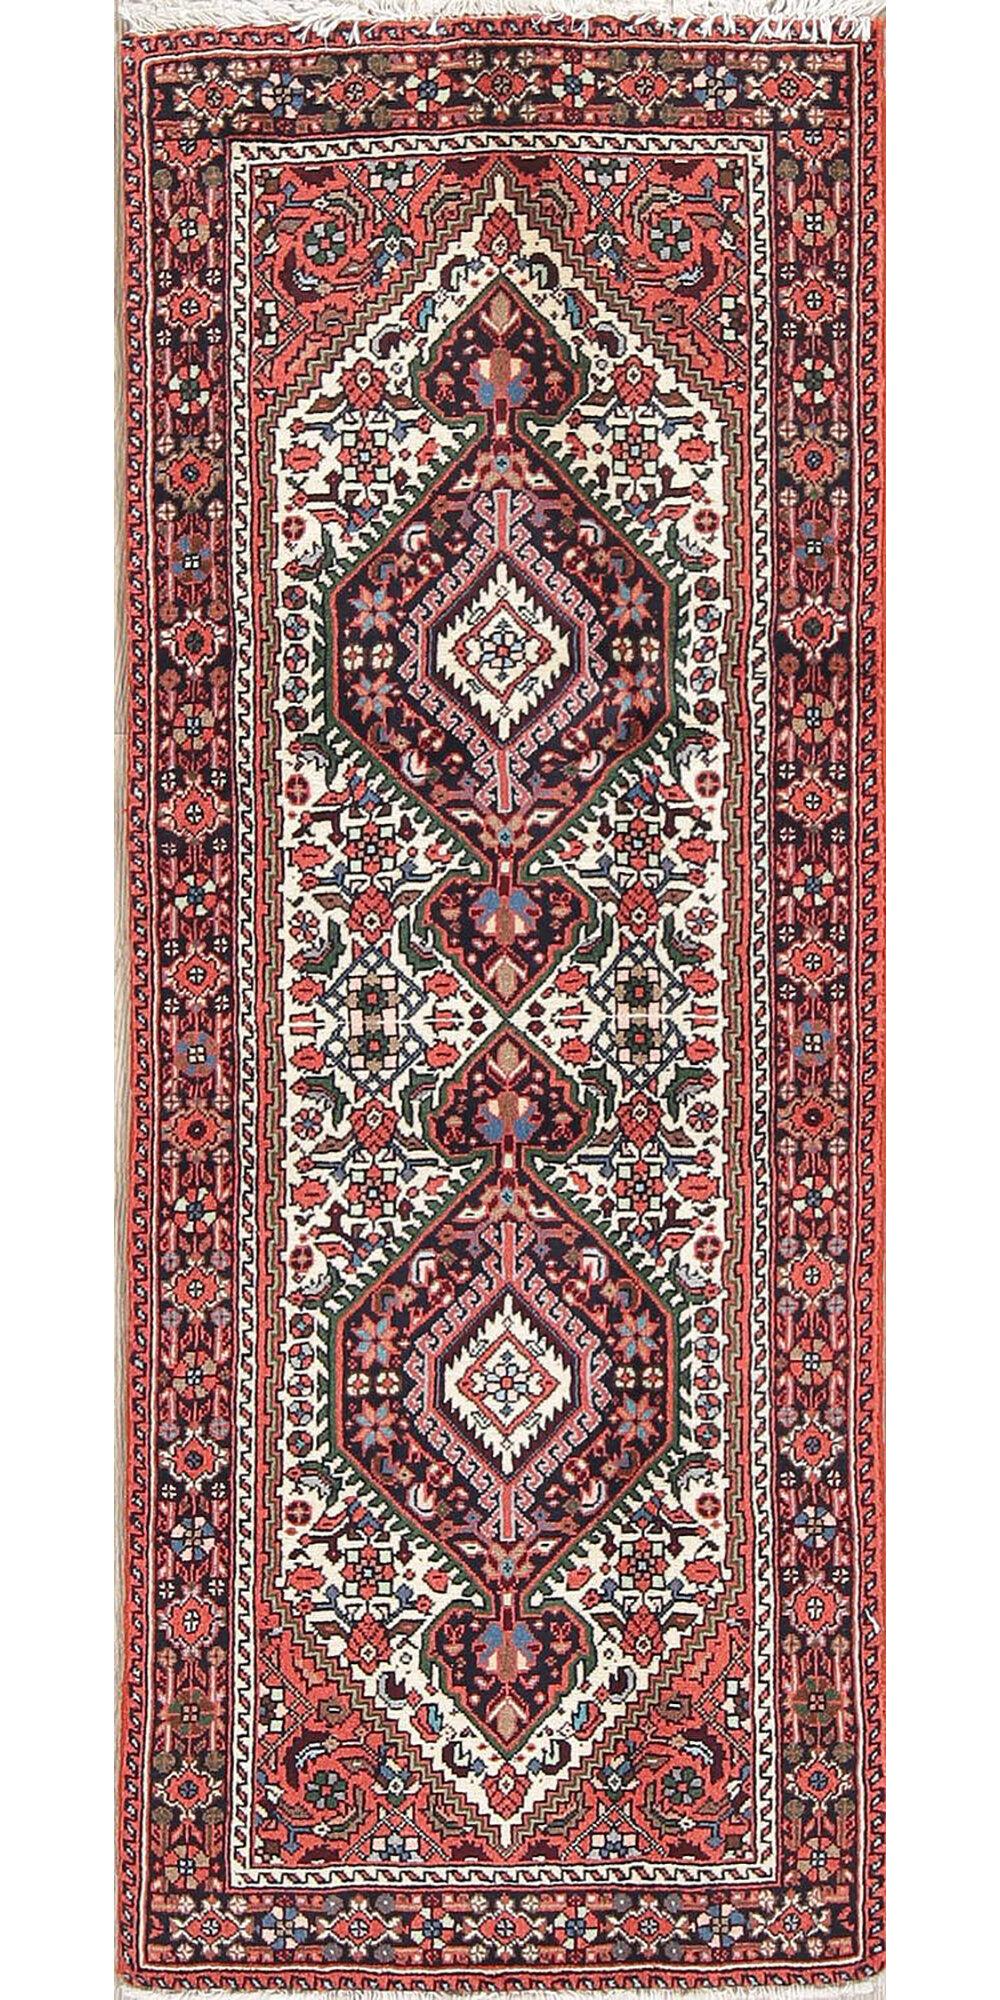 Topsfield Ivory Geometric Bidjar Persian Style Runner Rug 4 11 X 1 11